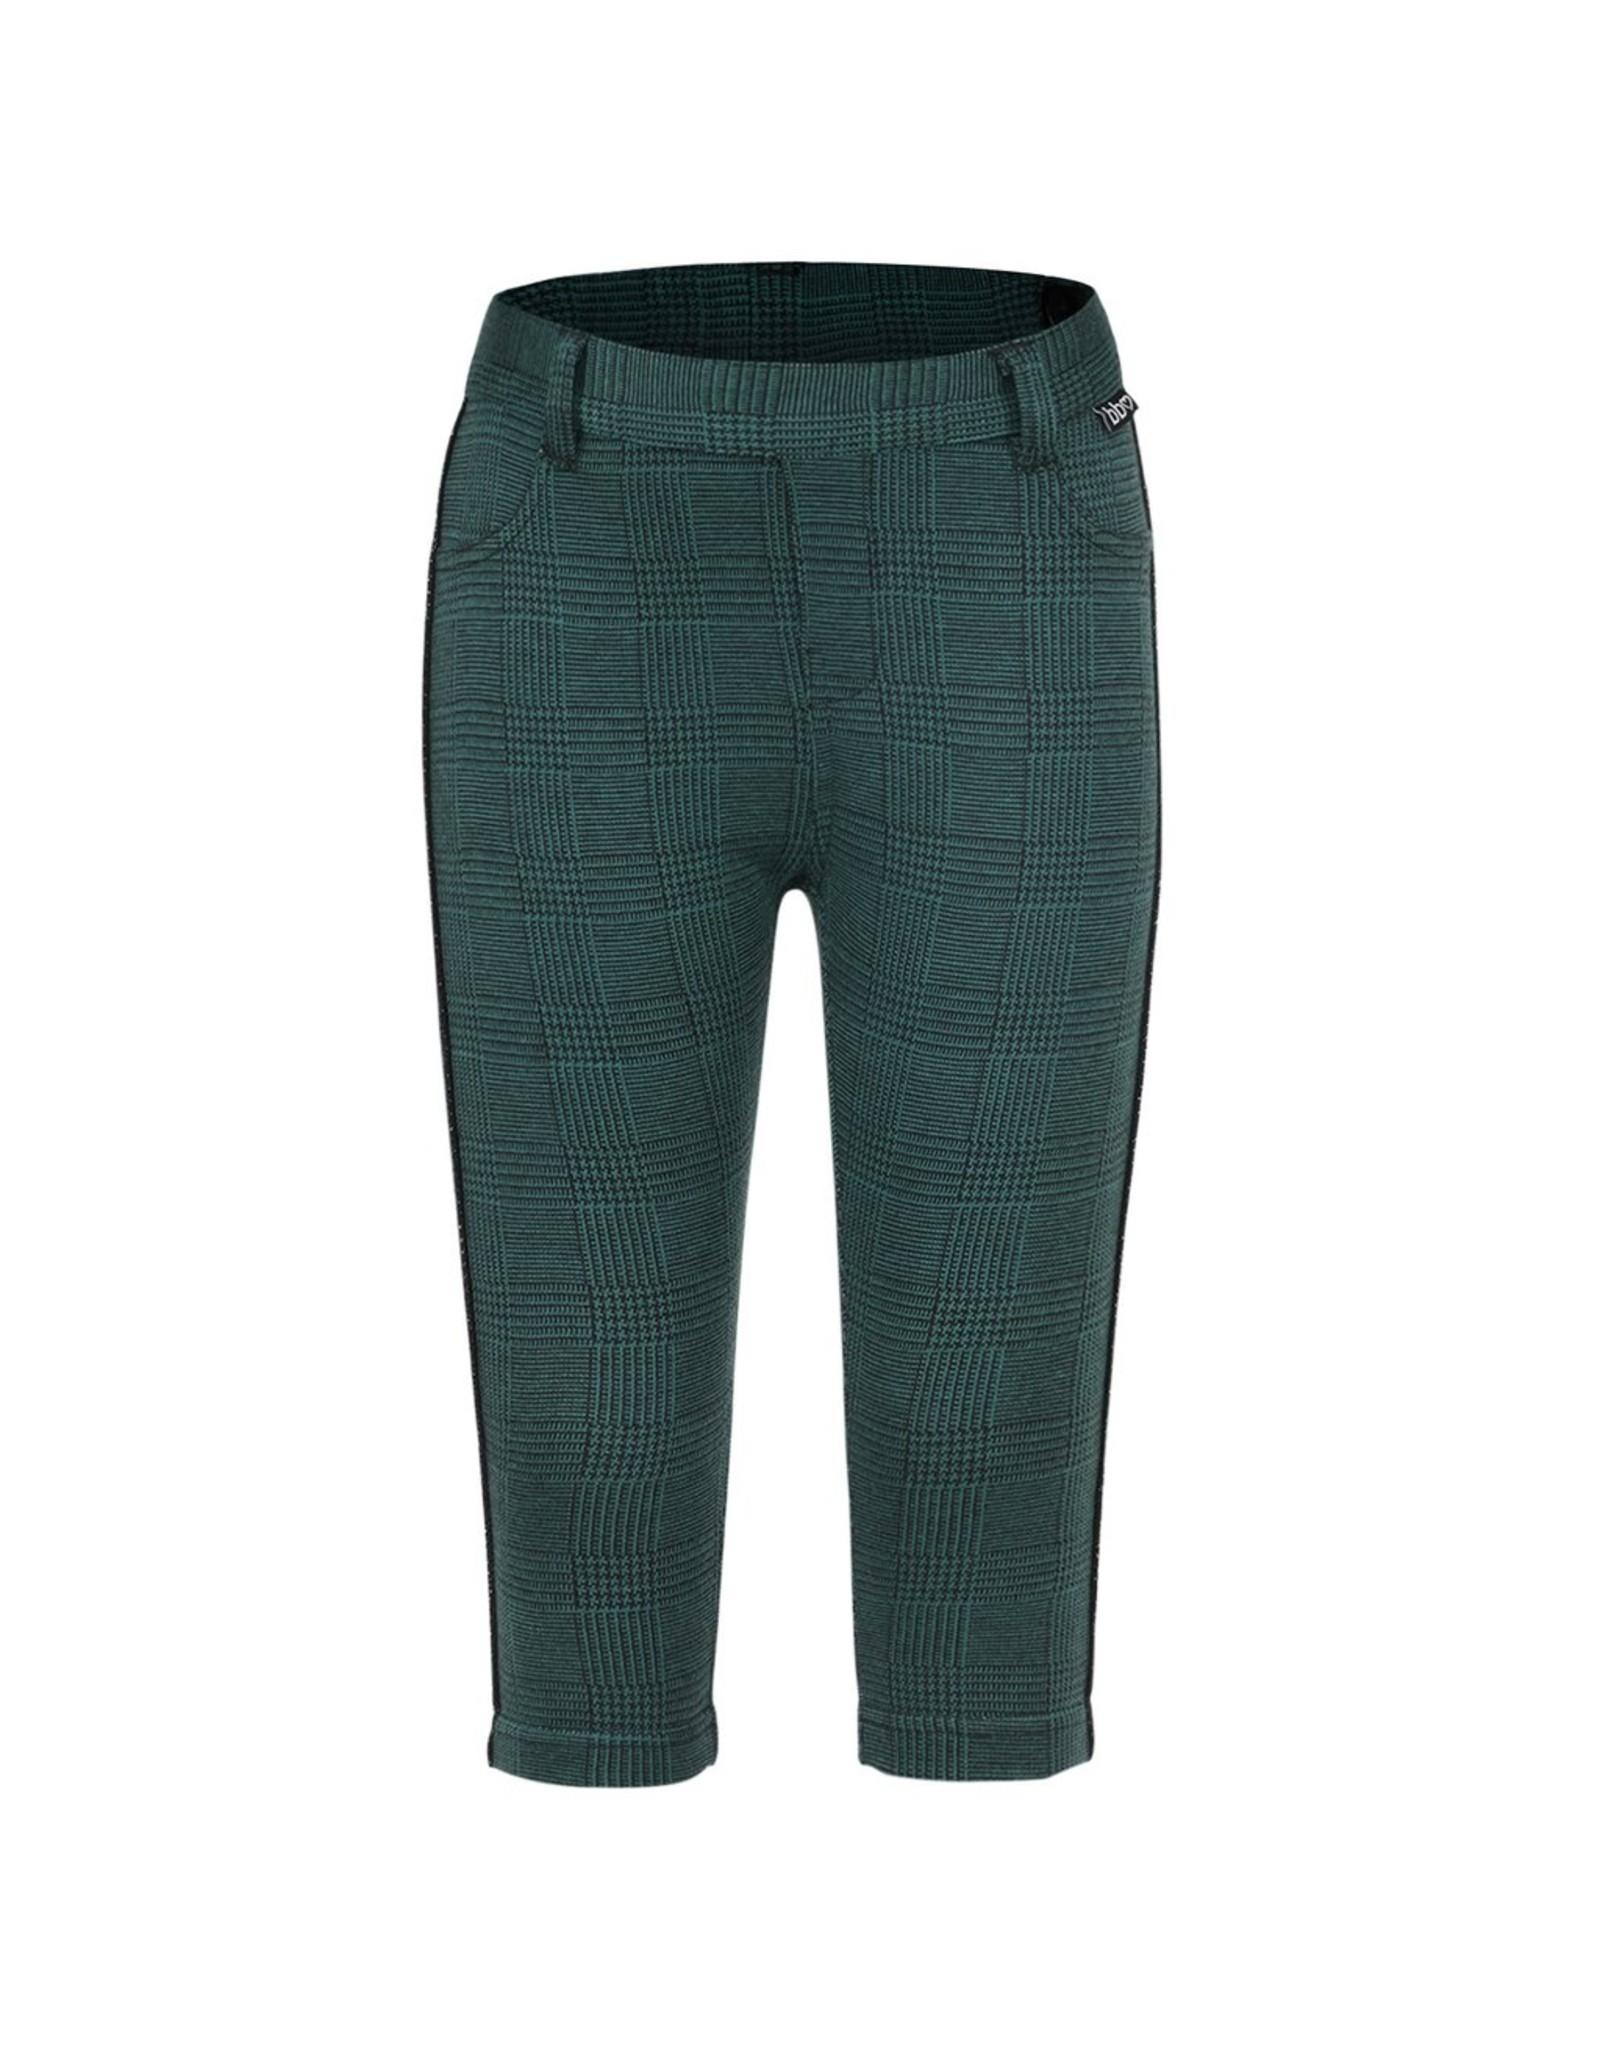 Beebielove 2533 Check pants